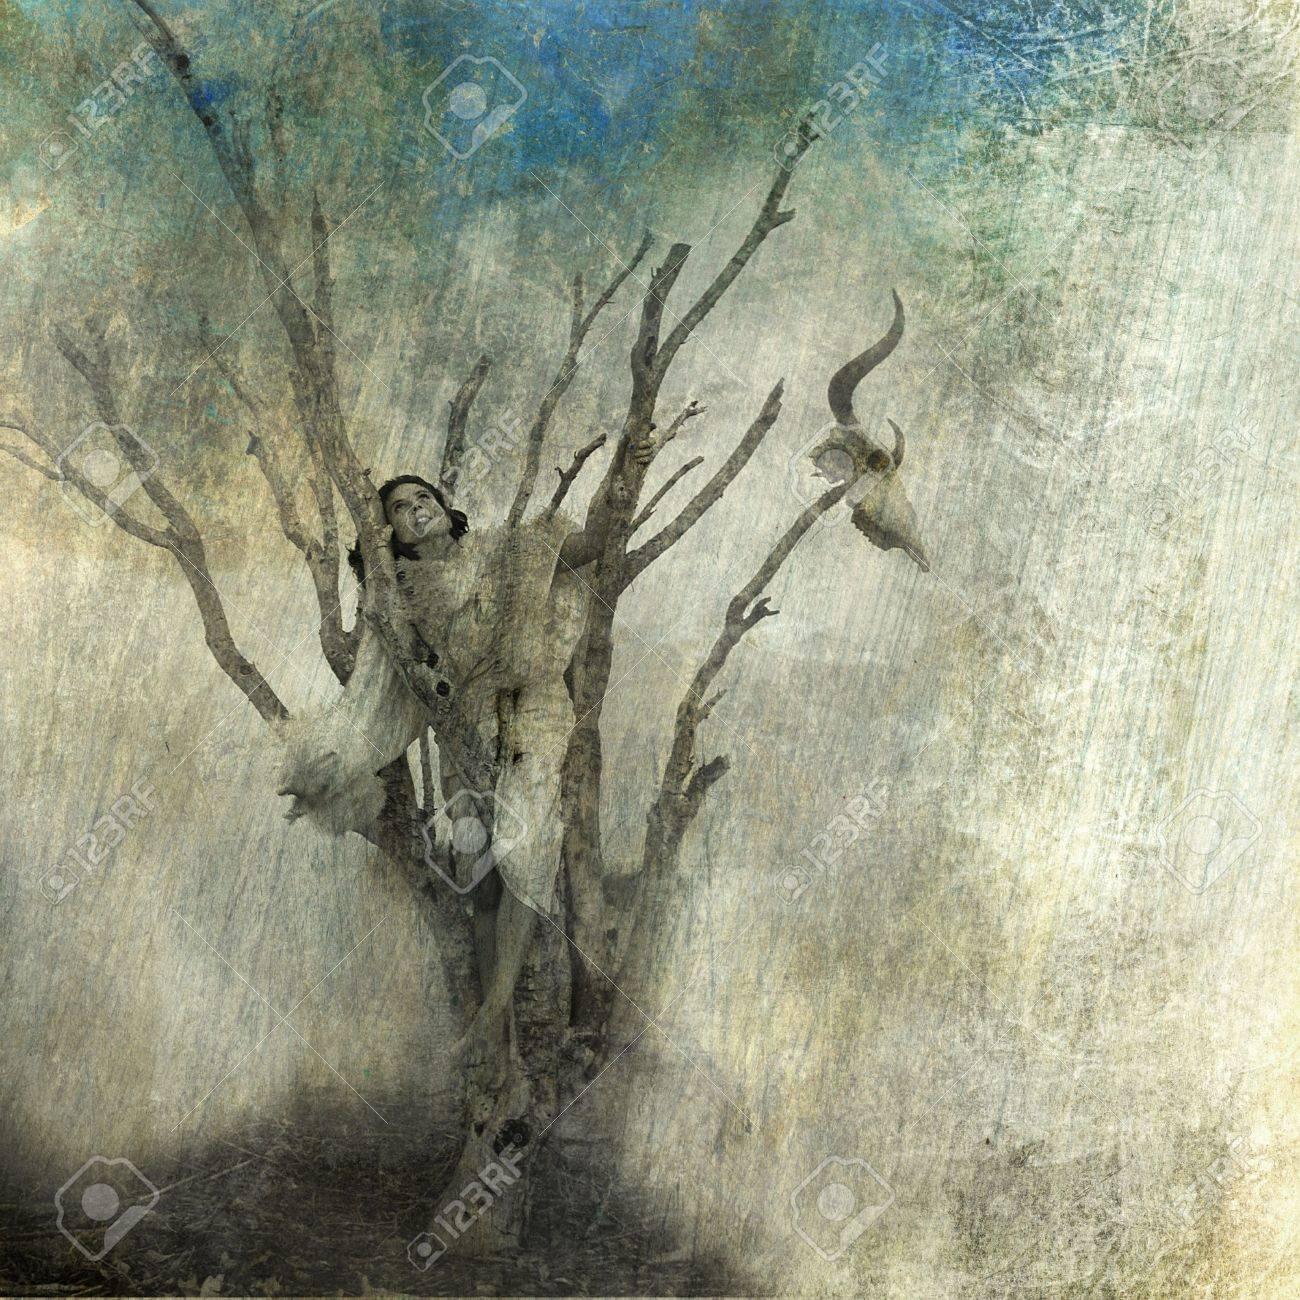 Woman in dead tree. Photo based mixed medium art. - 5161203